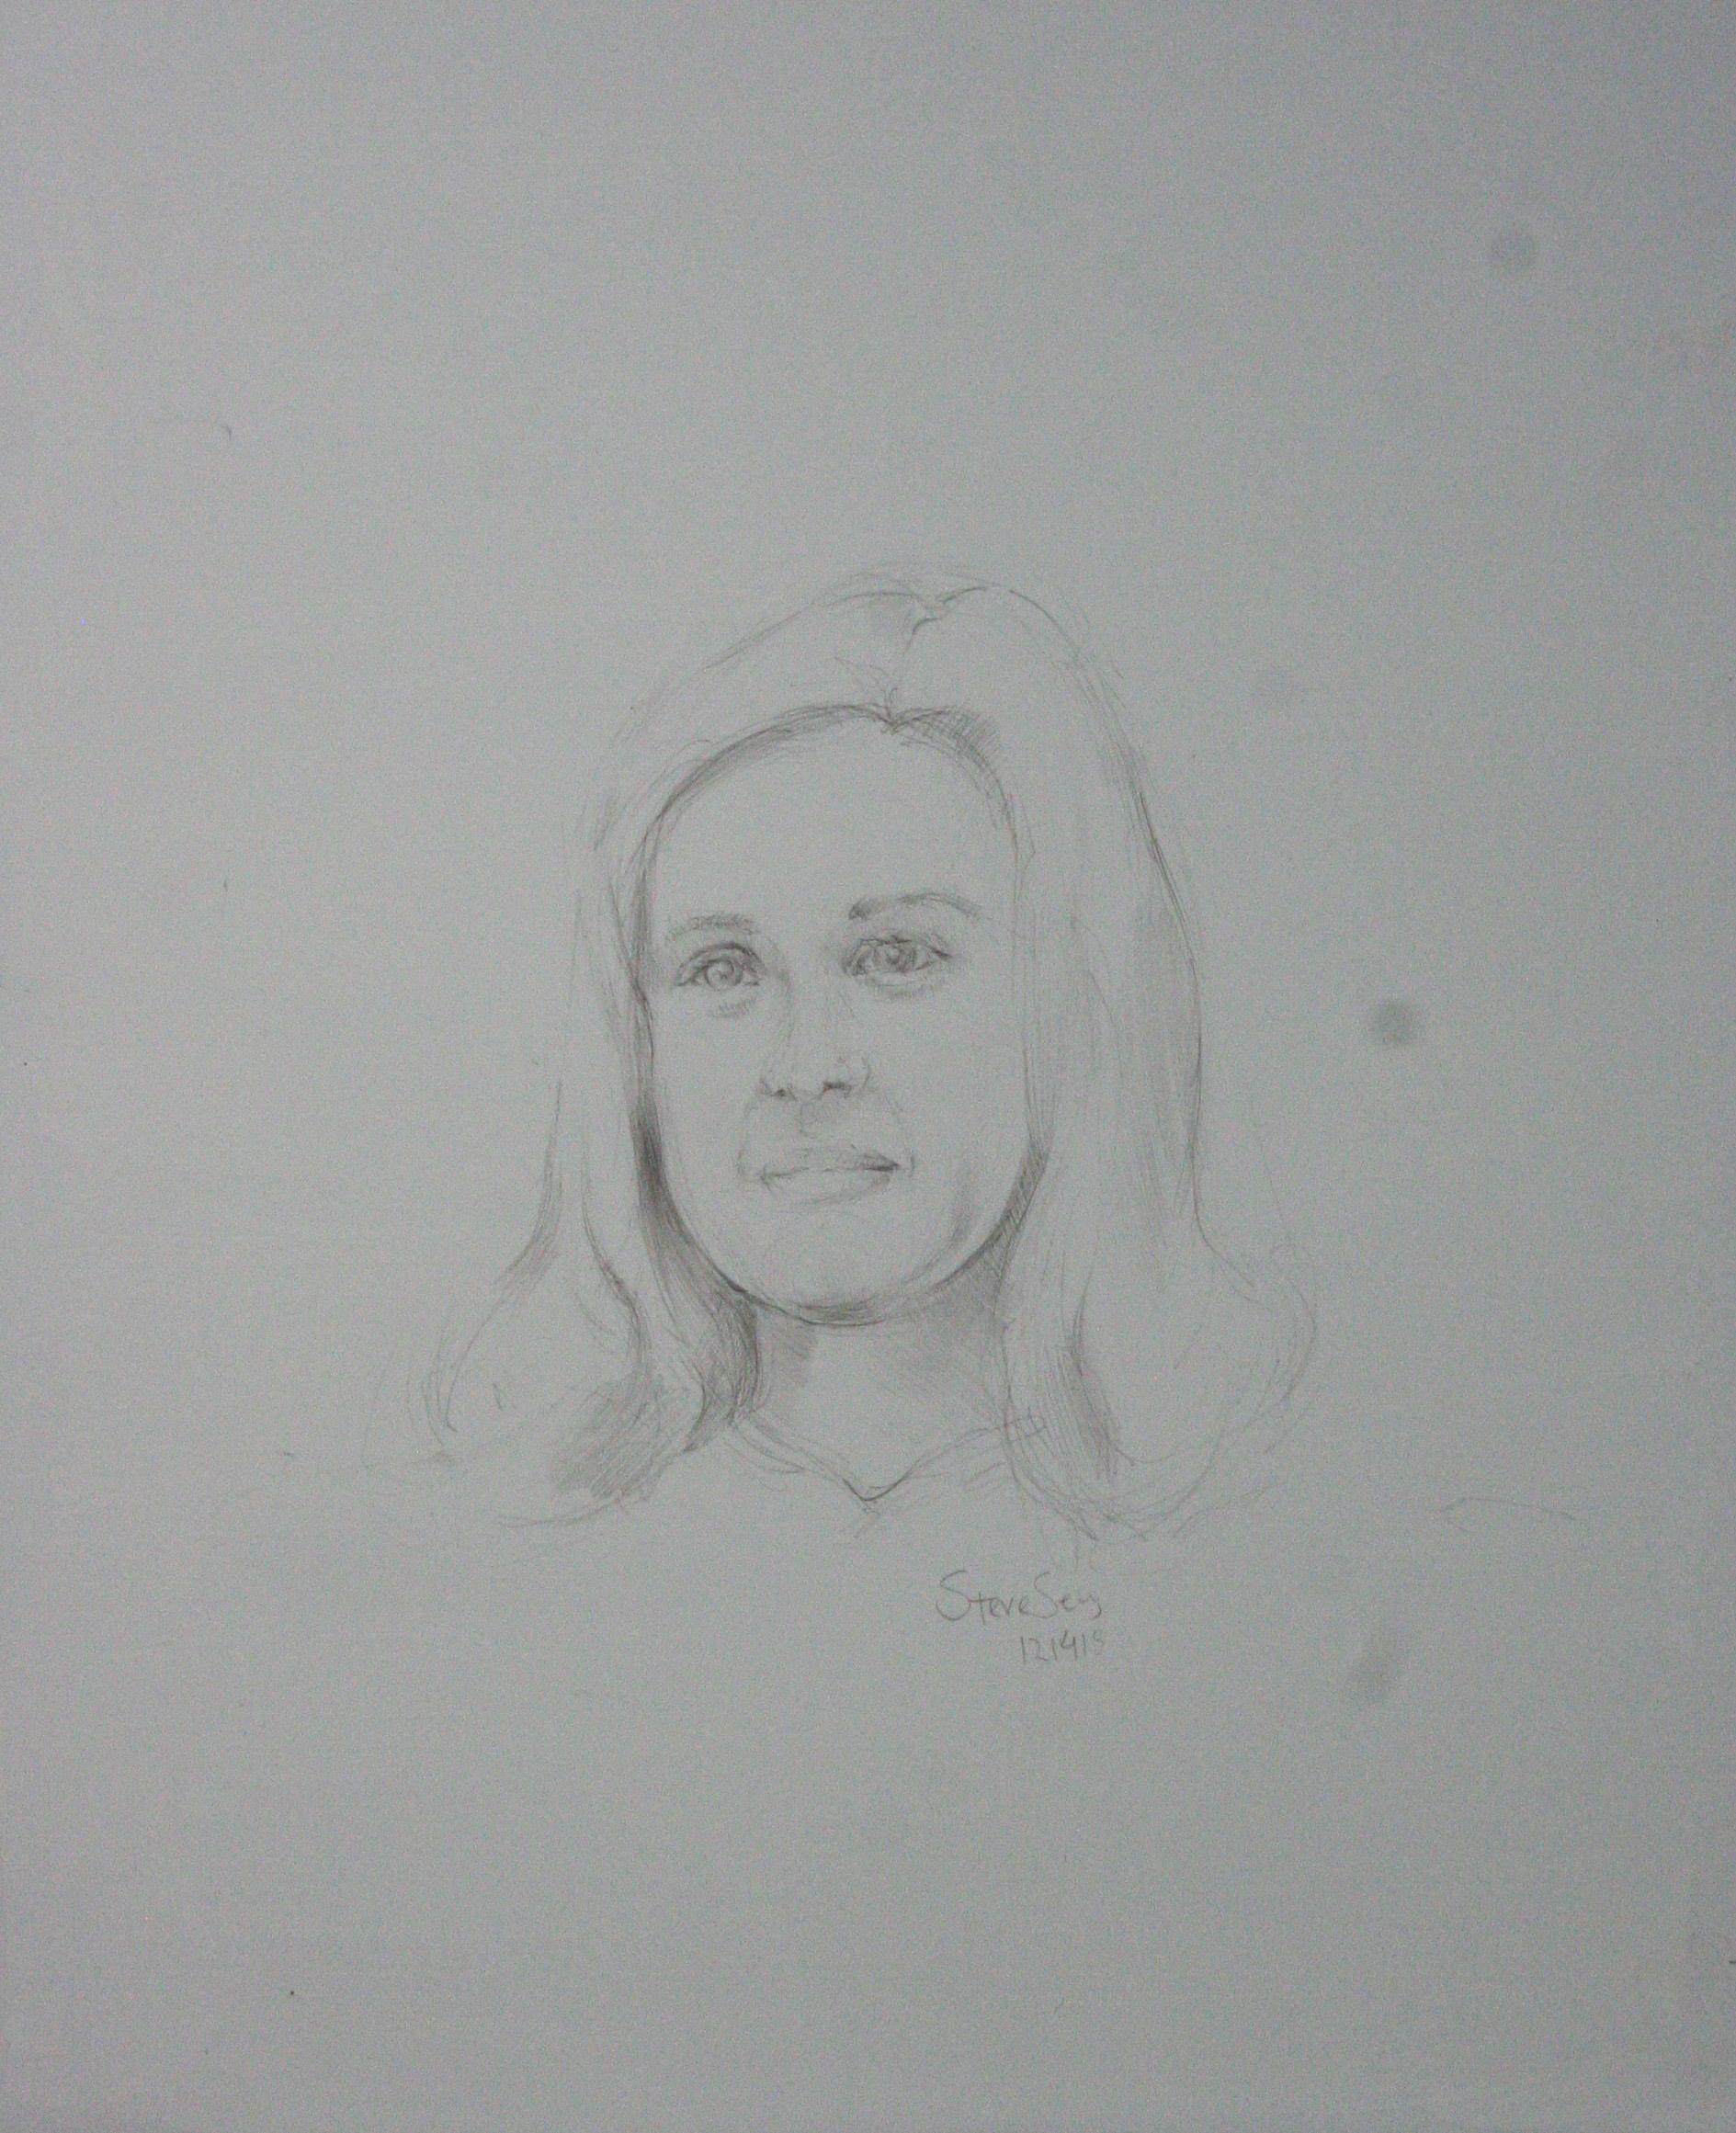 Steve Sens did this drawing of Tillie.